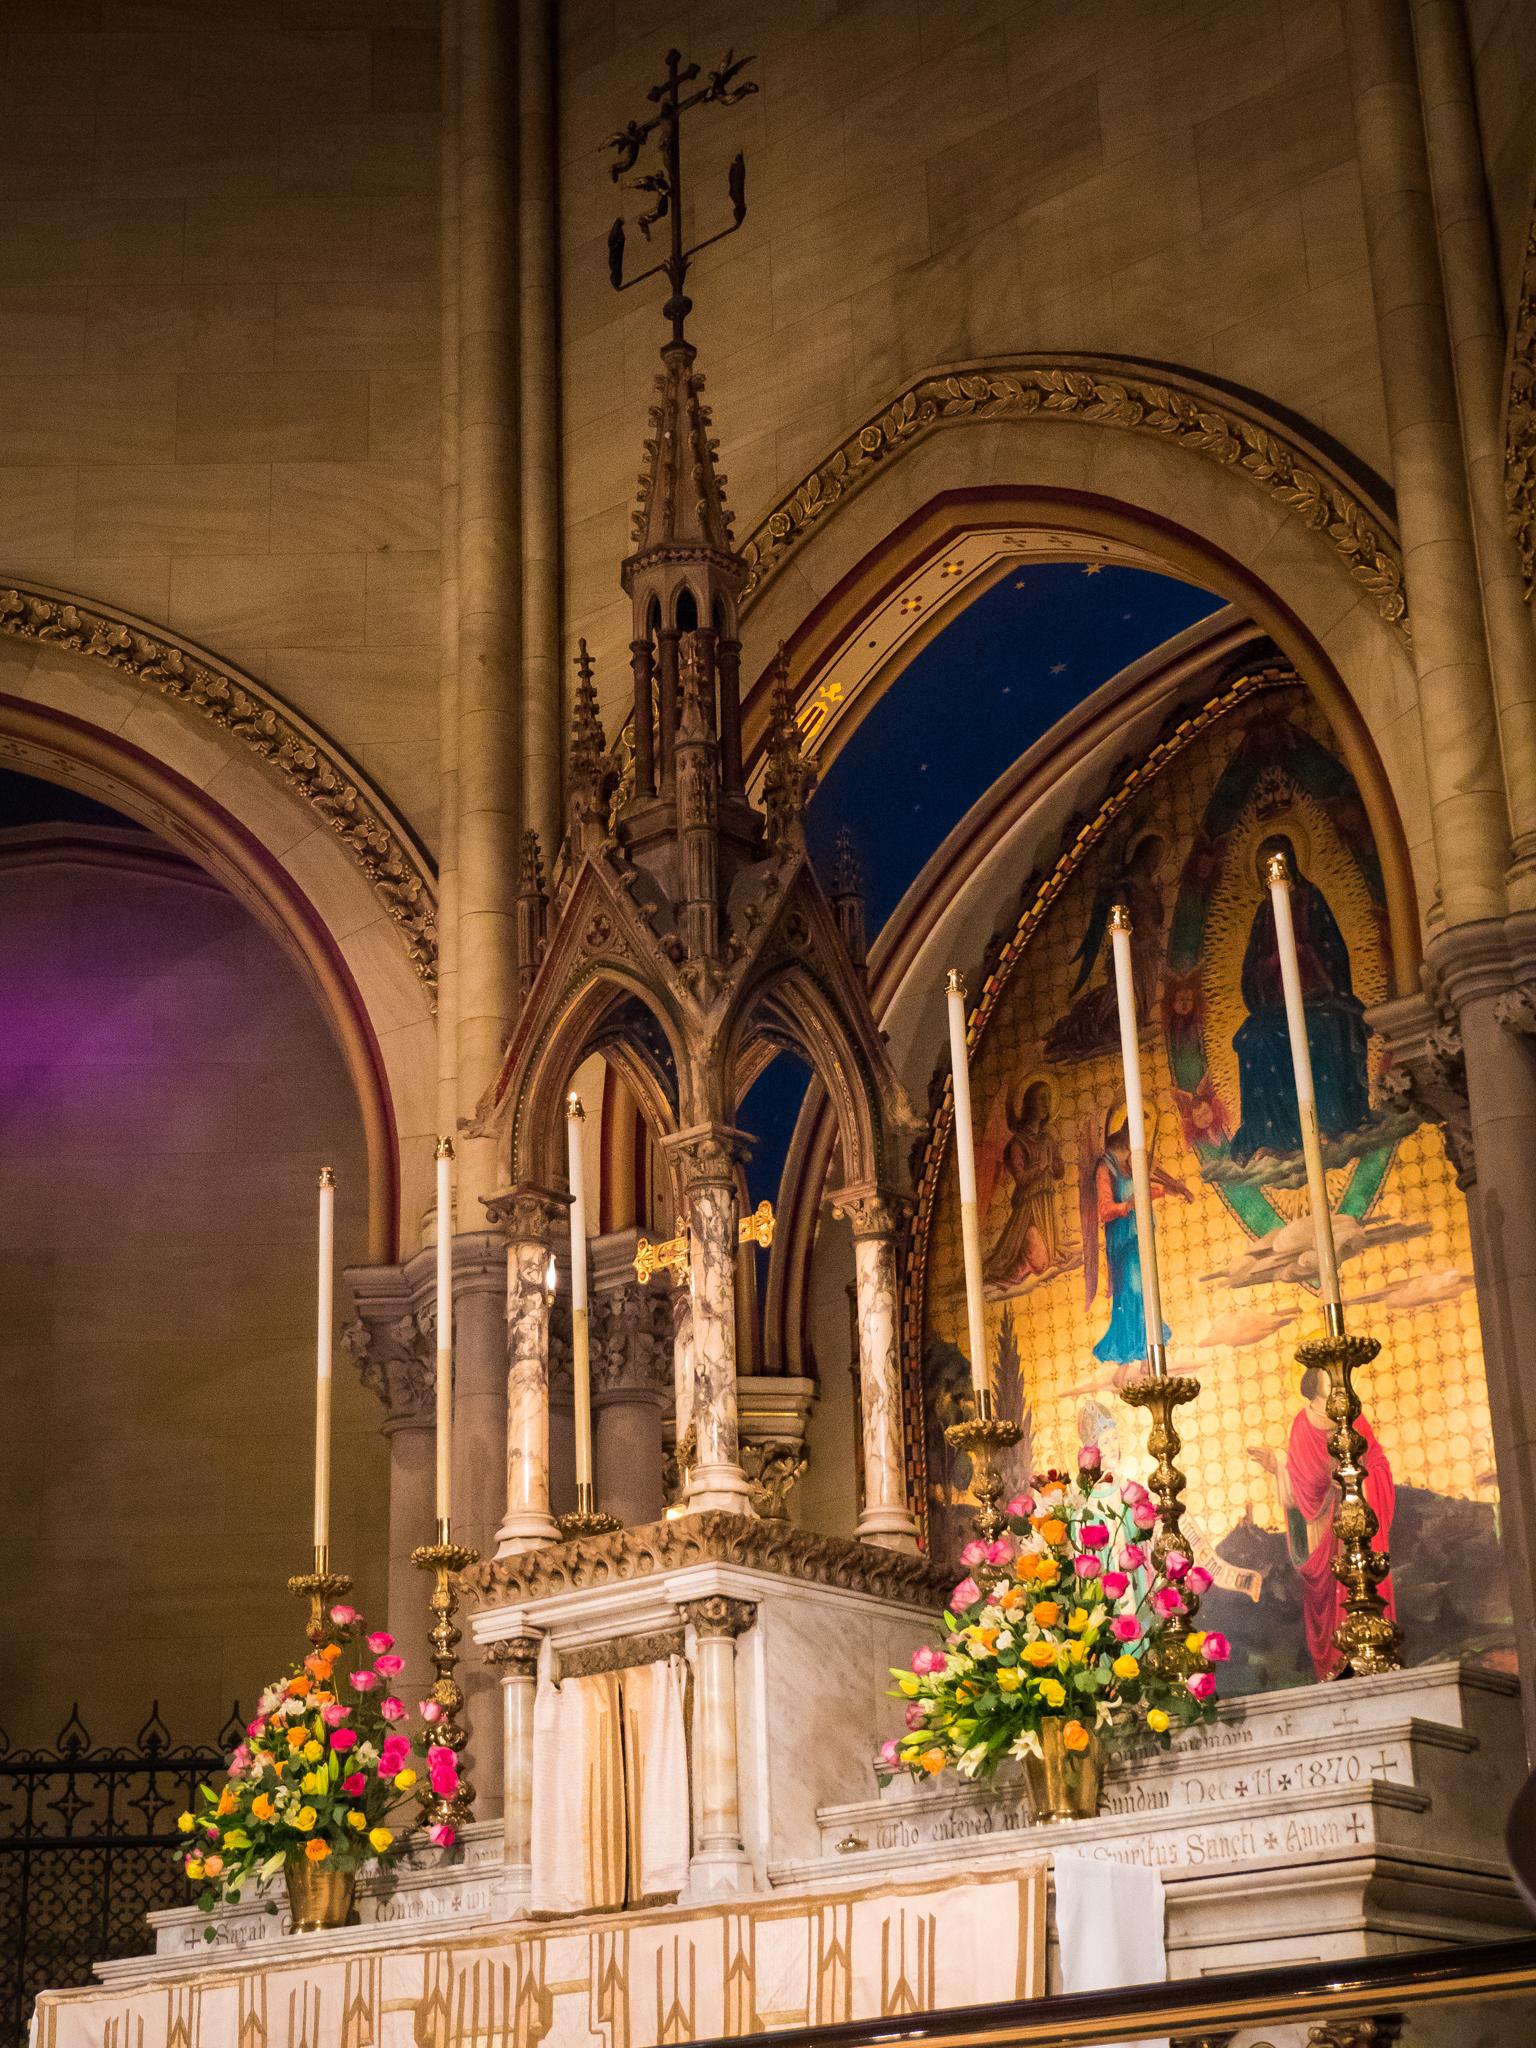 The High Altar, Sunday, April 22, 2018   Photo by Ricardo Gomez